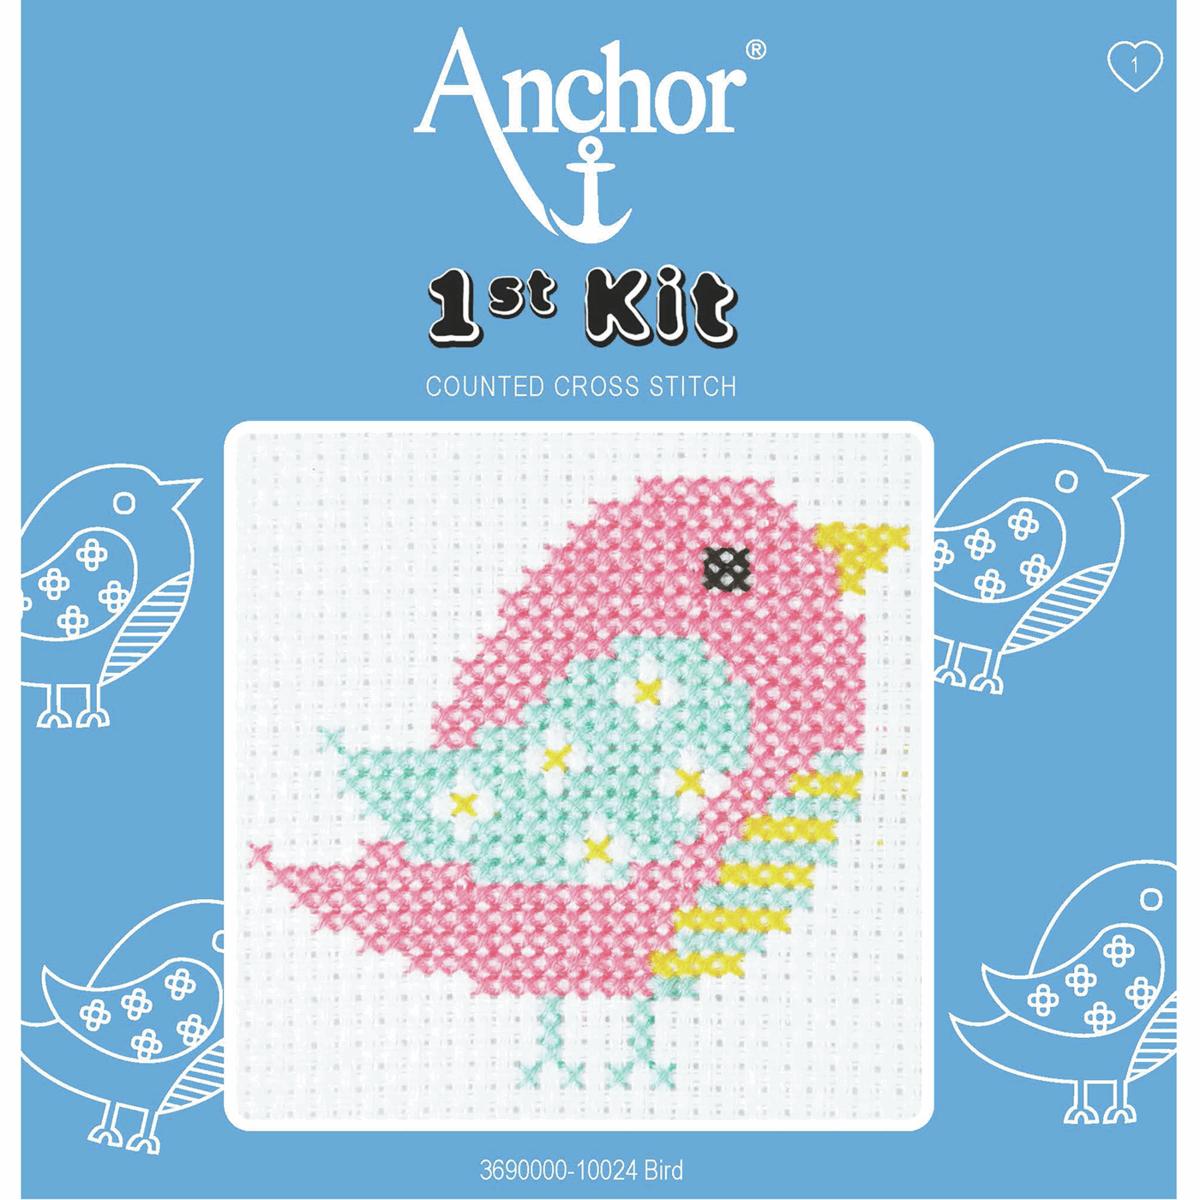 1st Cross Stitch Kit by Anchor - Bird